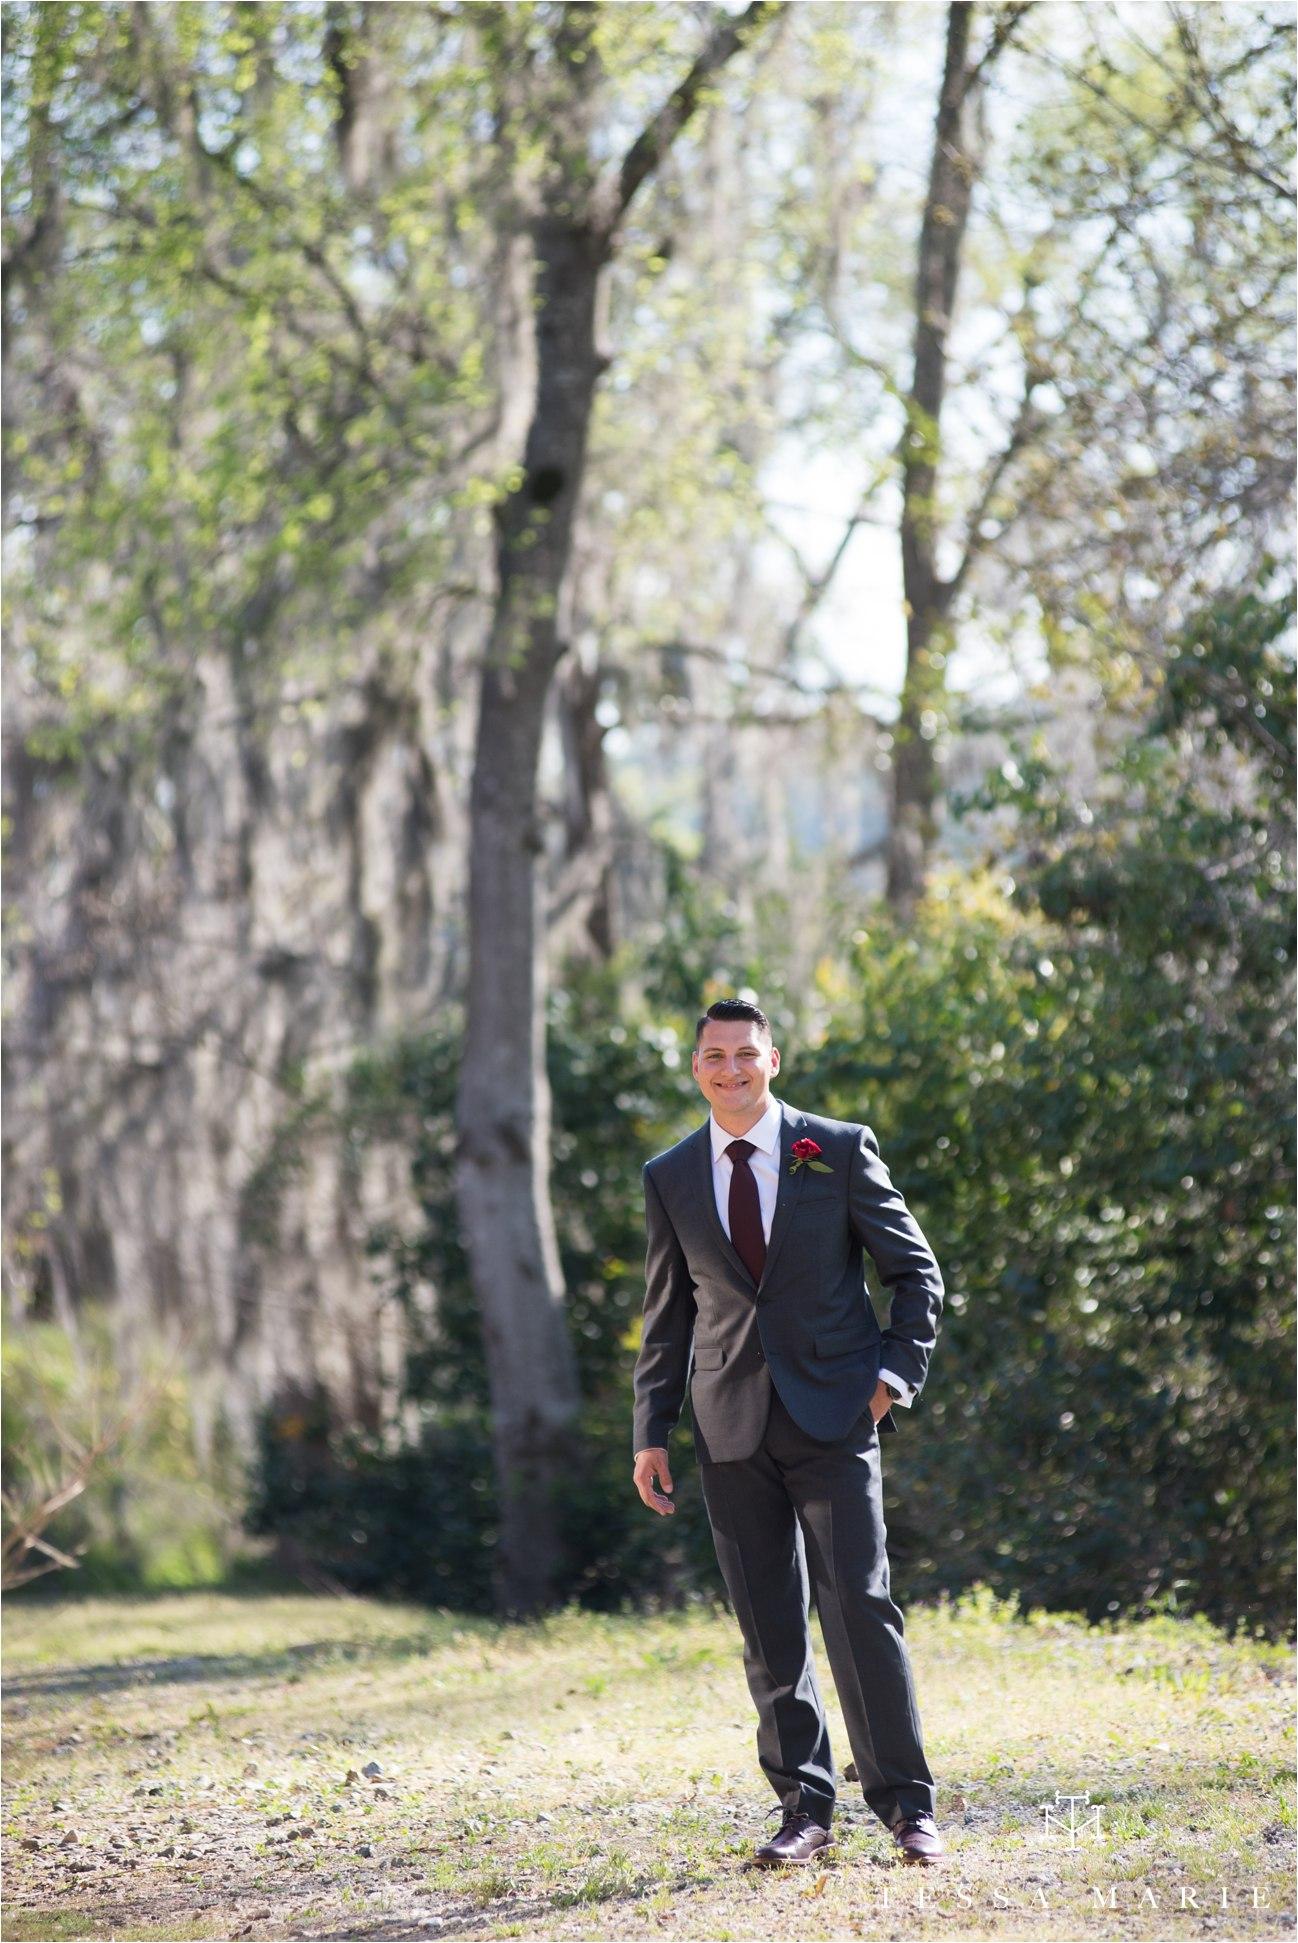 tessa_marie_weddings_rivermill_event_centere_candid_outdoor_wedding_photos_0146